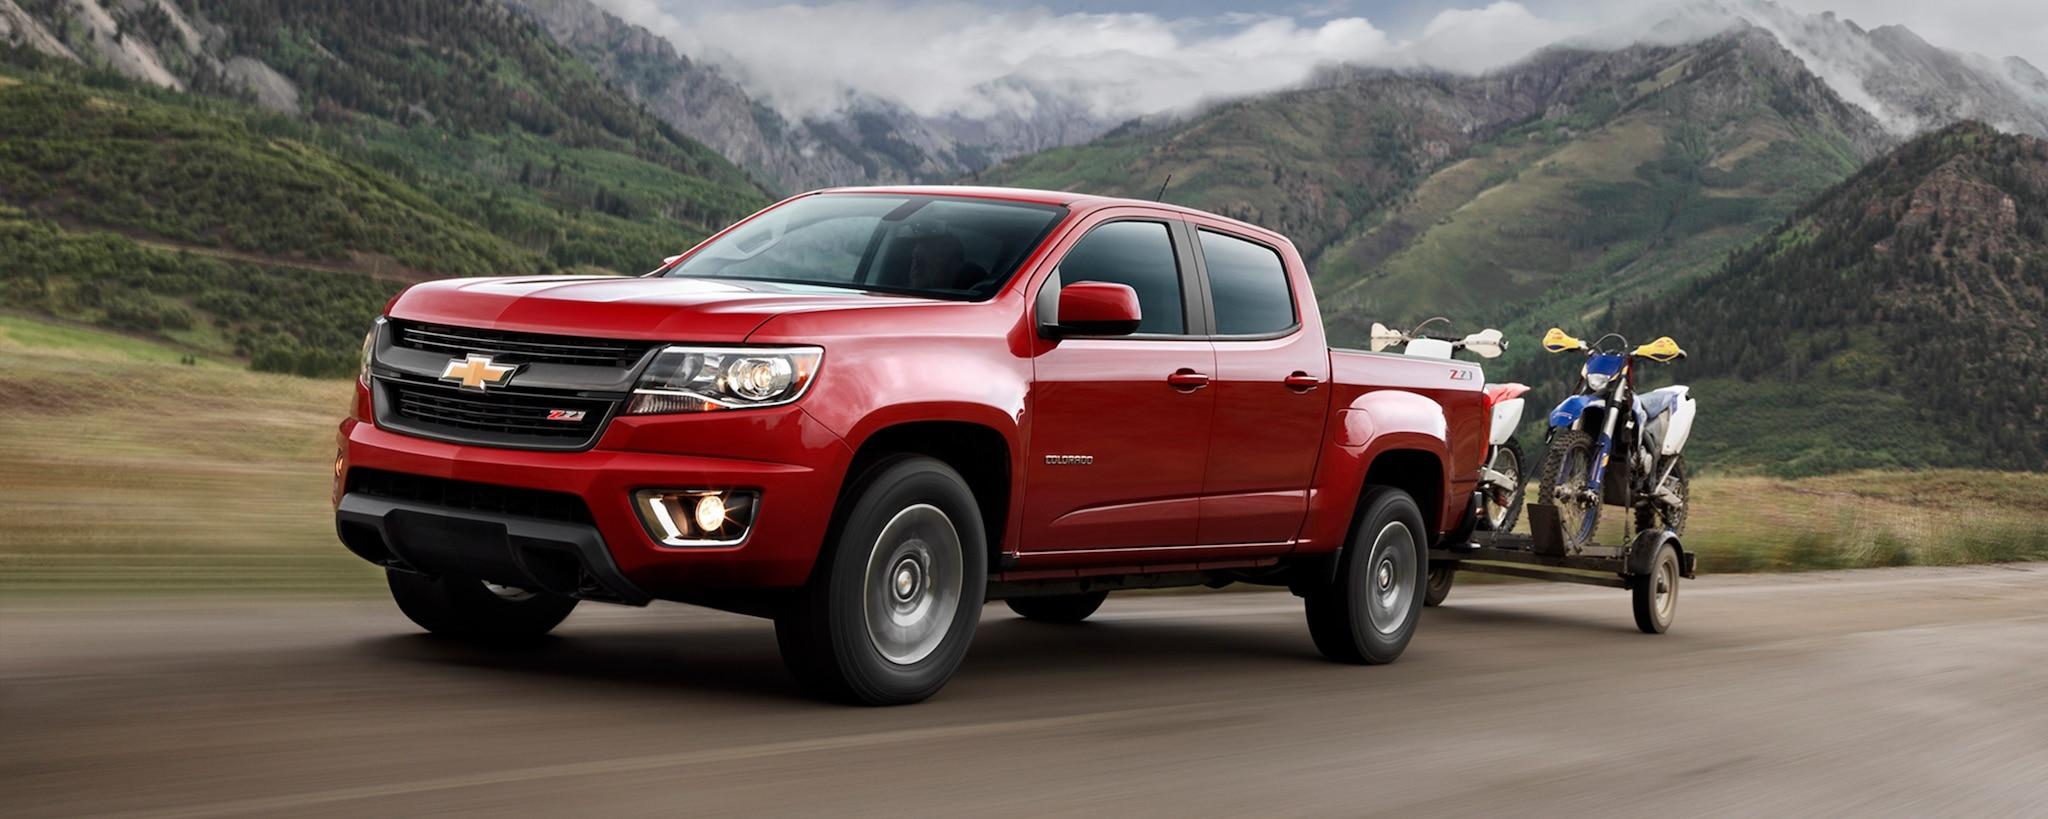 2020 Chevrolet Colorado Performance